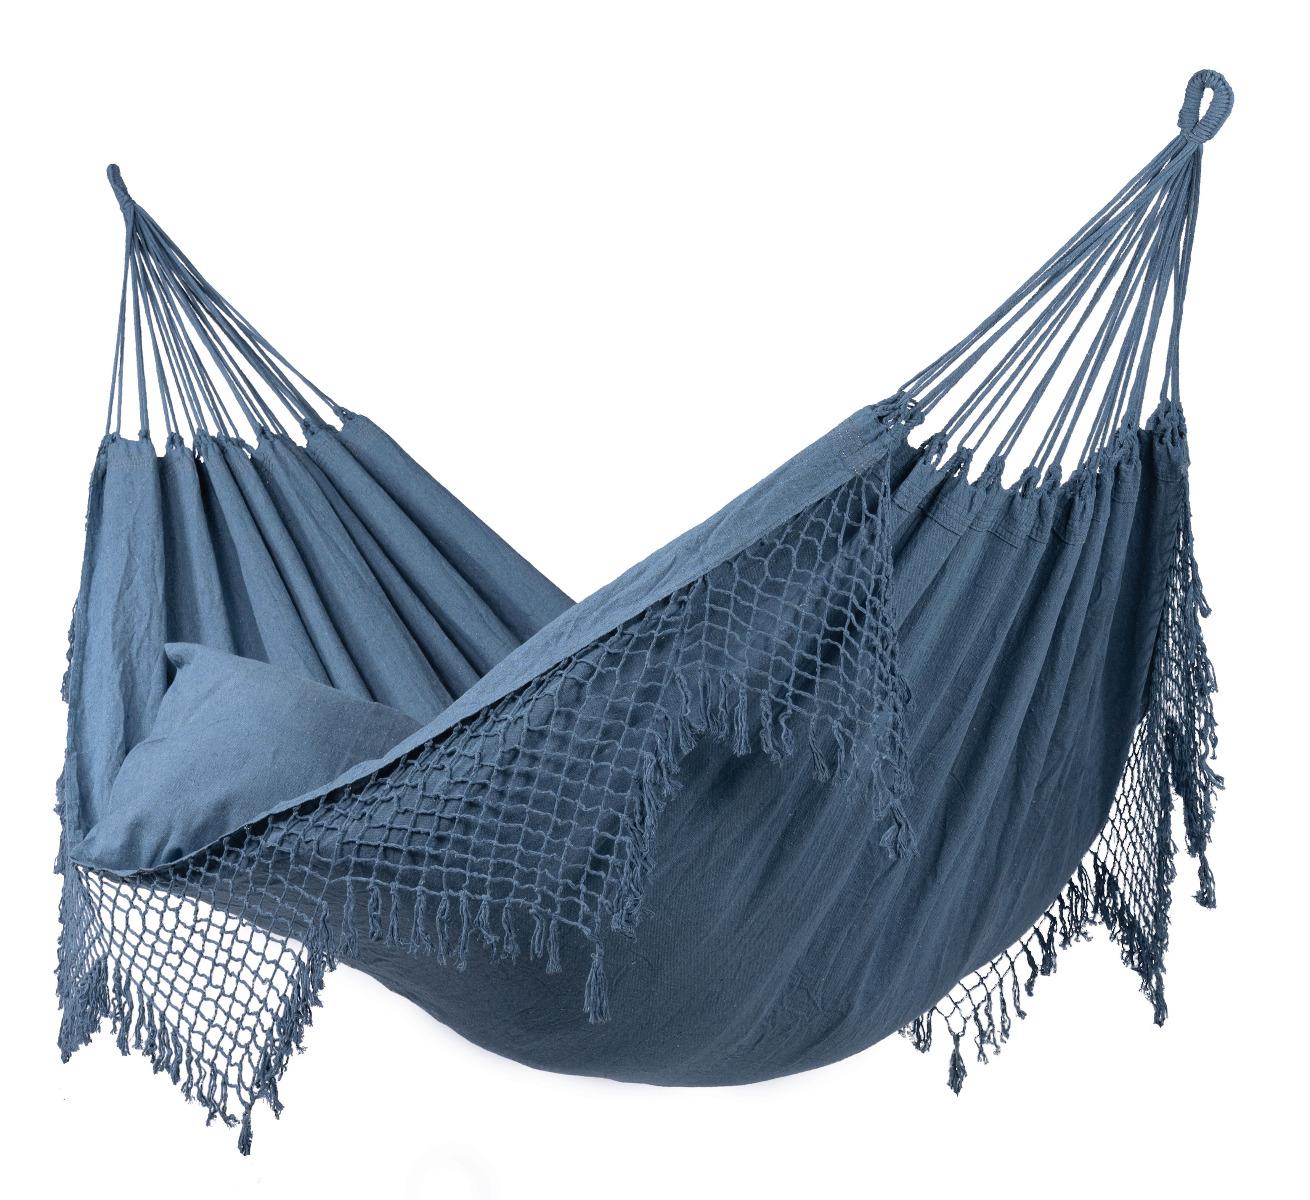 'Fine' Jeans XXL Hangmat - Blauw - Tropilex �